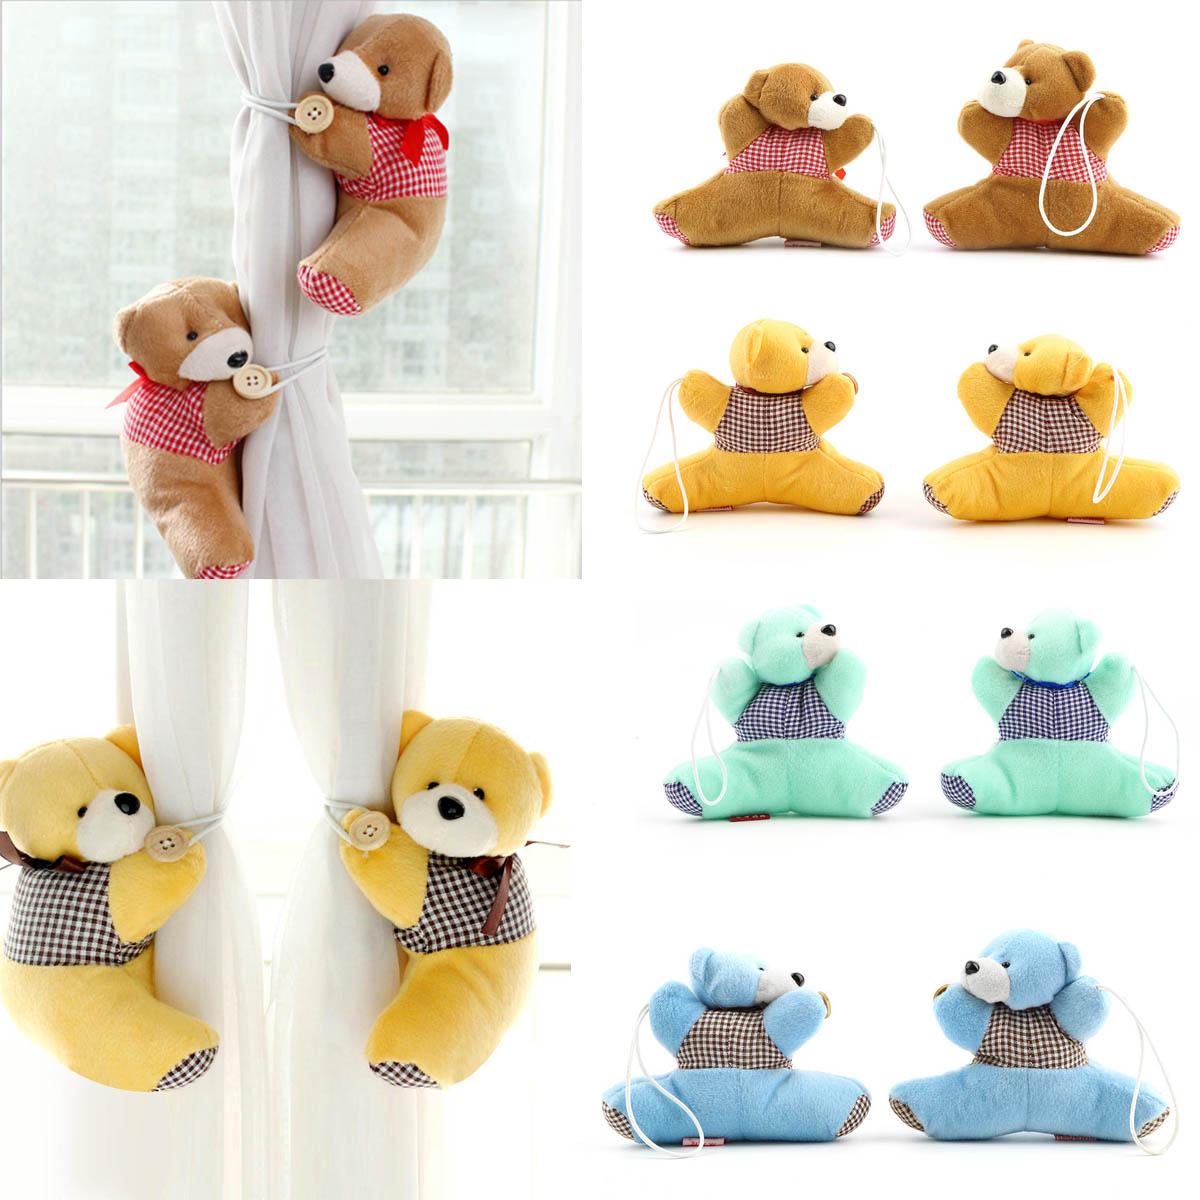 1 Pair Baby Kid Cartoon Bear Holder Nursery Bedroom Curtain Tieback Buckle Hook 4 Colors Free Shipping&Wholesales(China (Mainland))